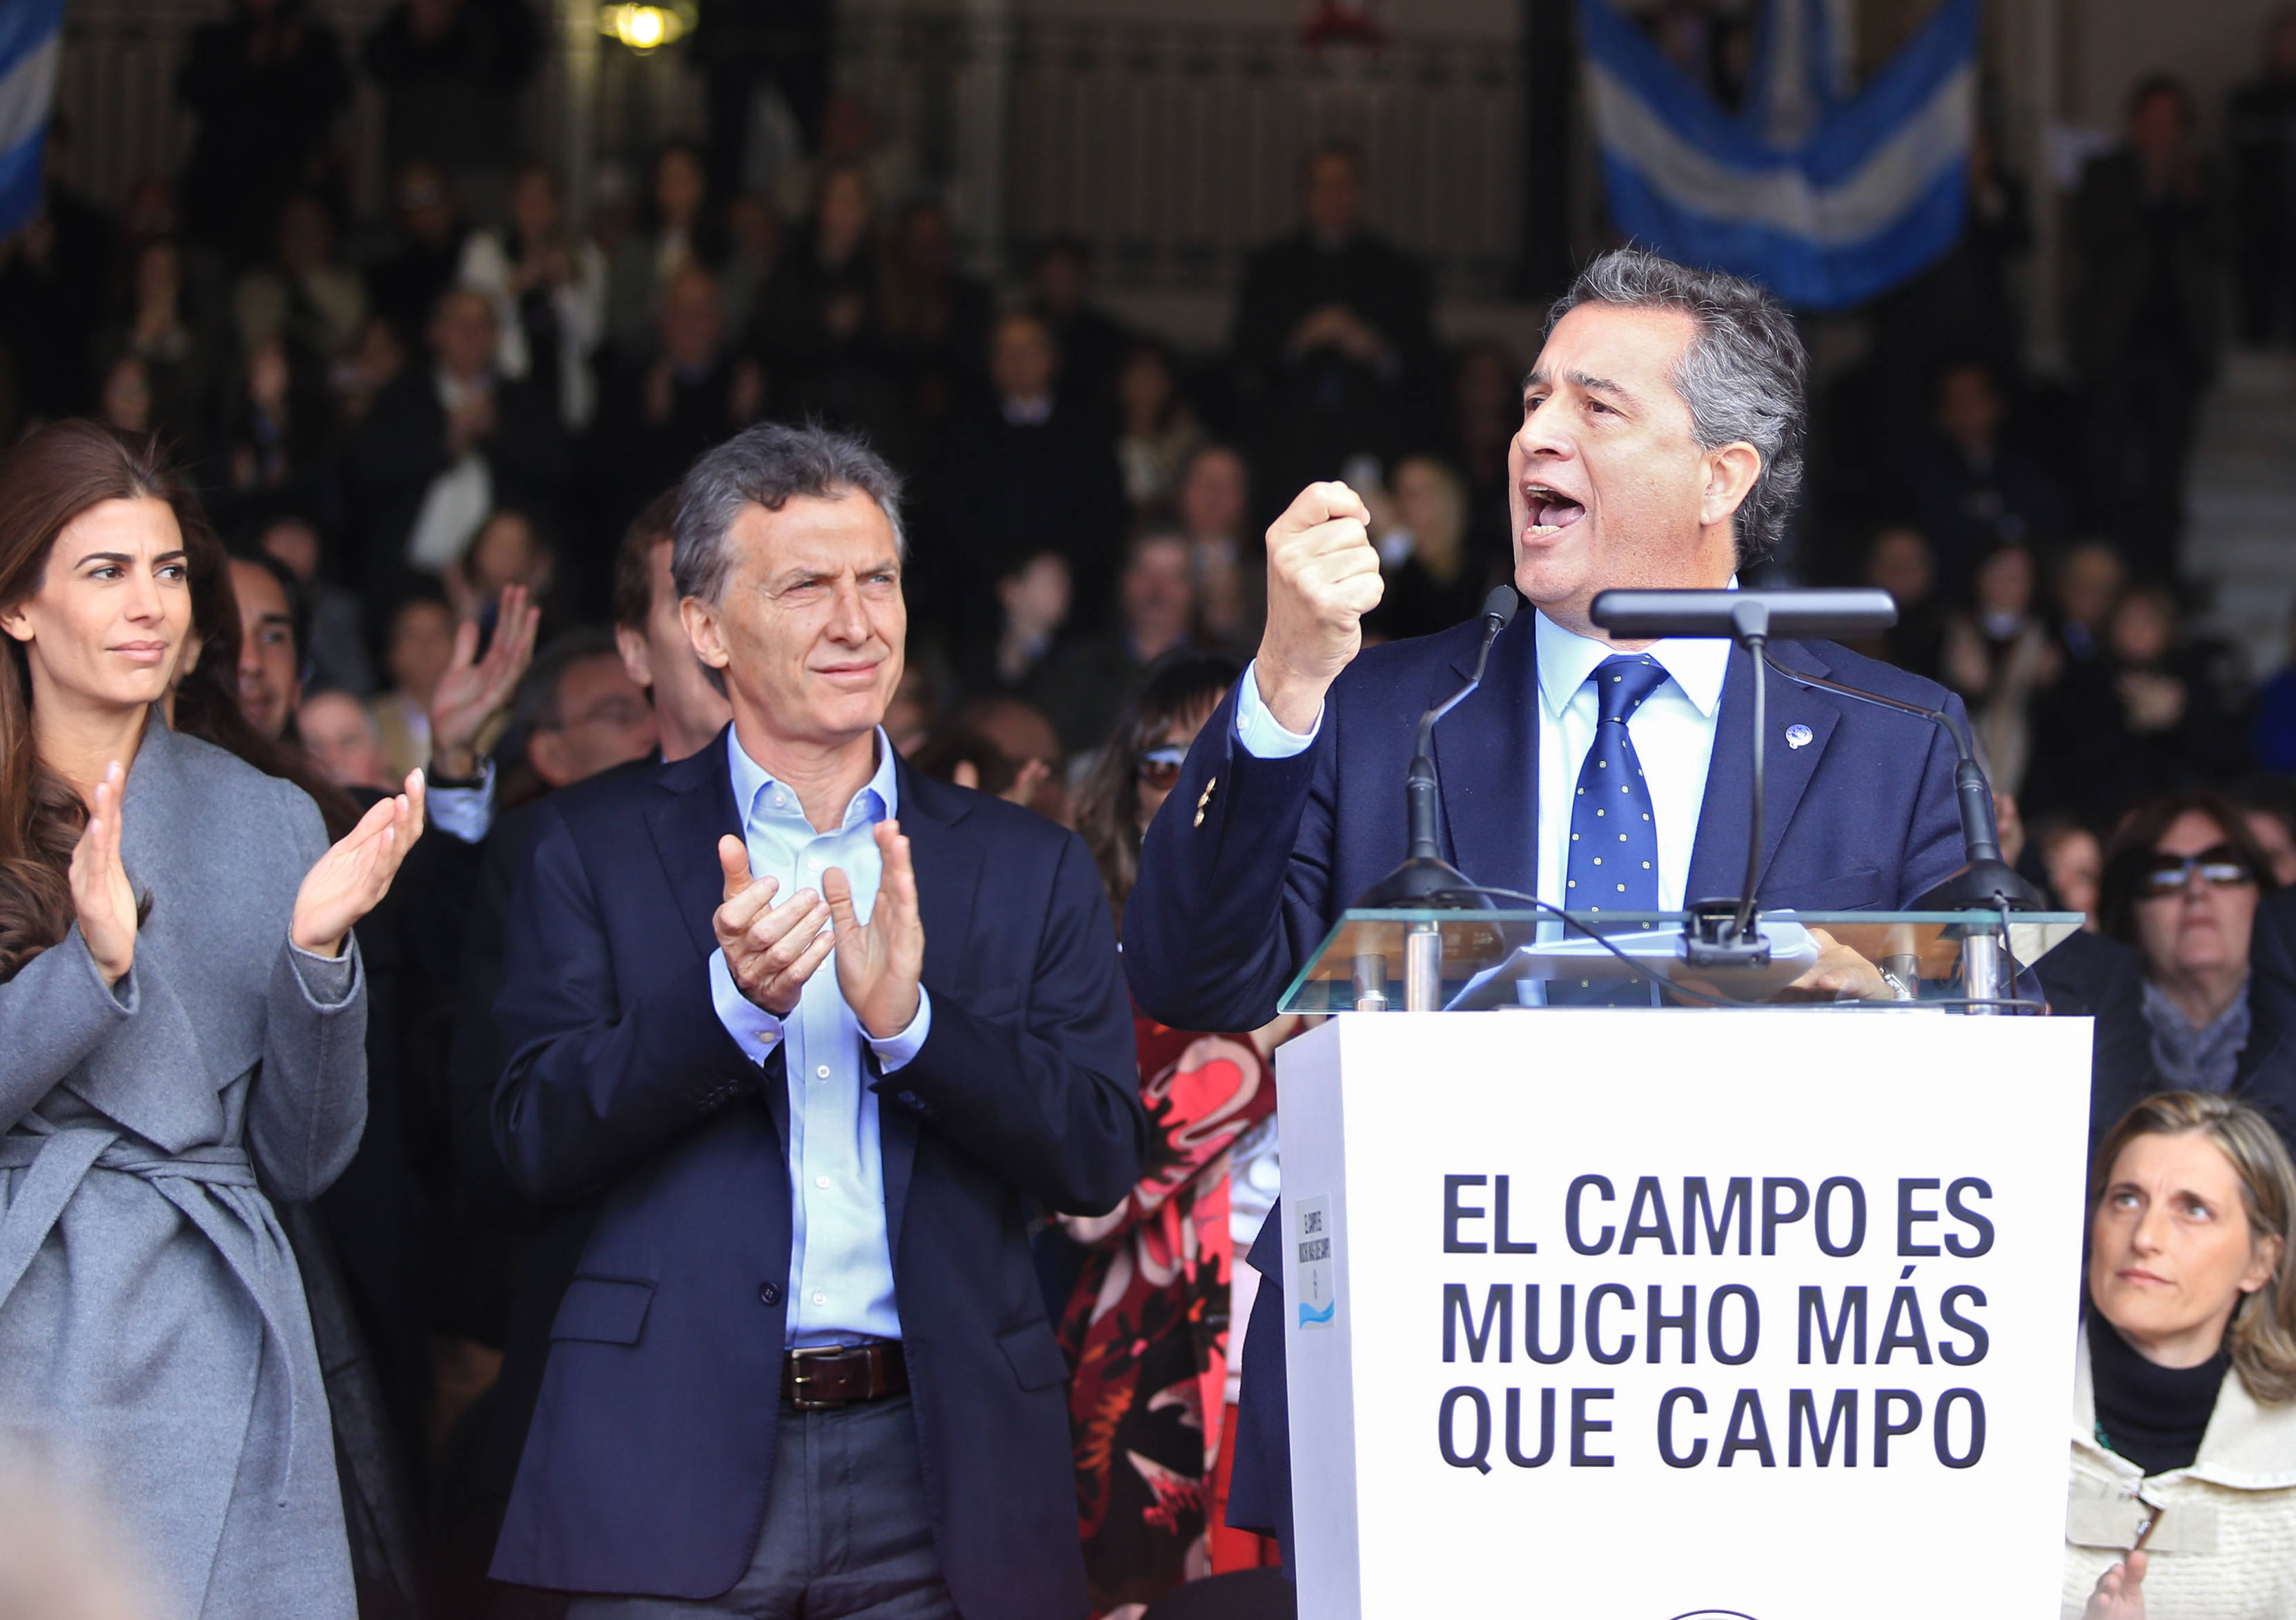 http://www.infobaires24.com.ar/wp-content/uploads/2016/03/sociedad-rural.jpg